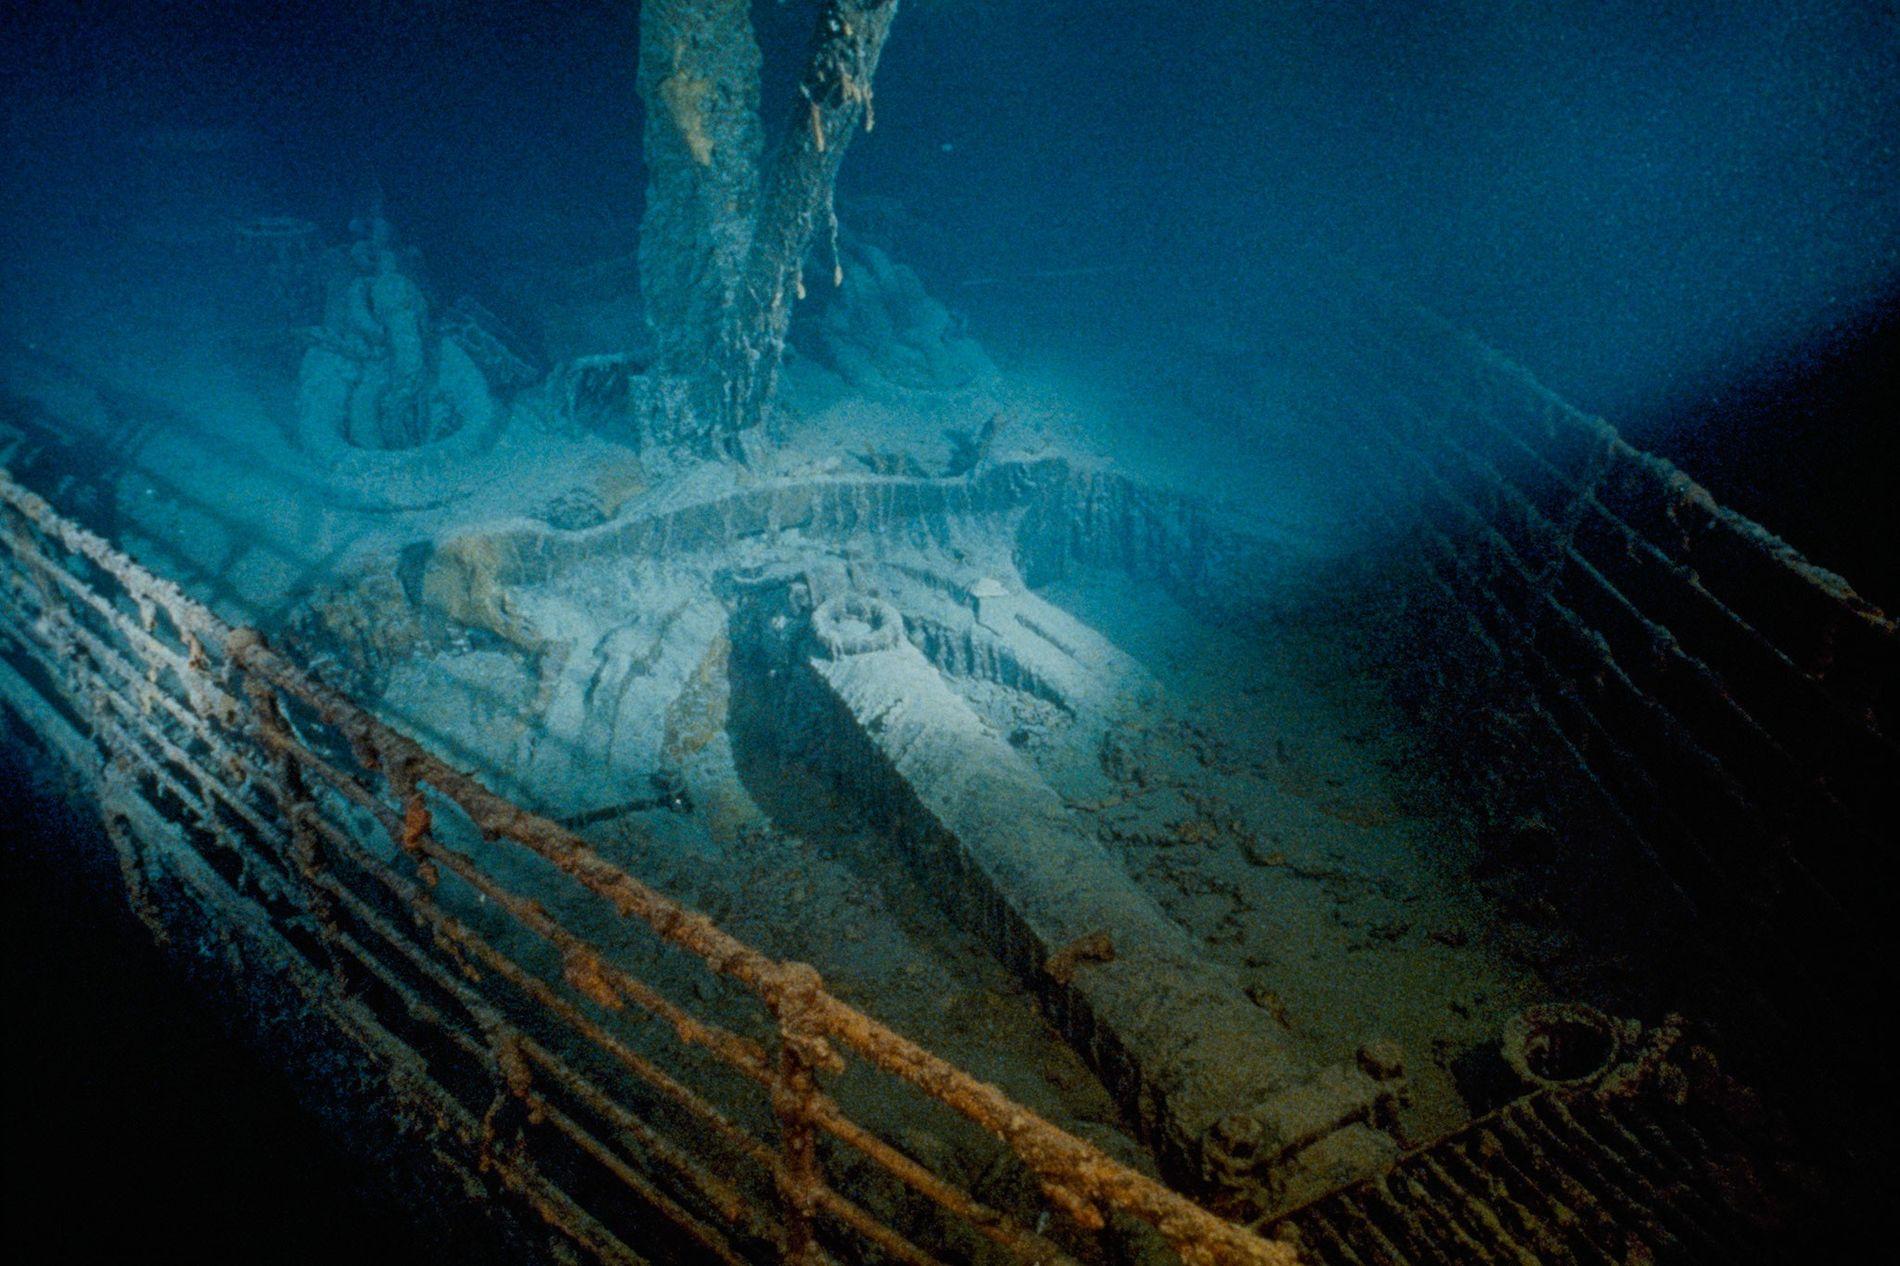 Титаник картинки с дна океана